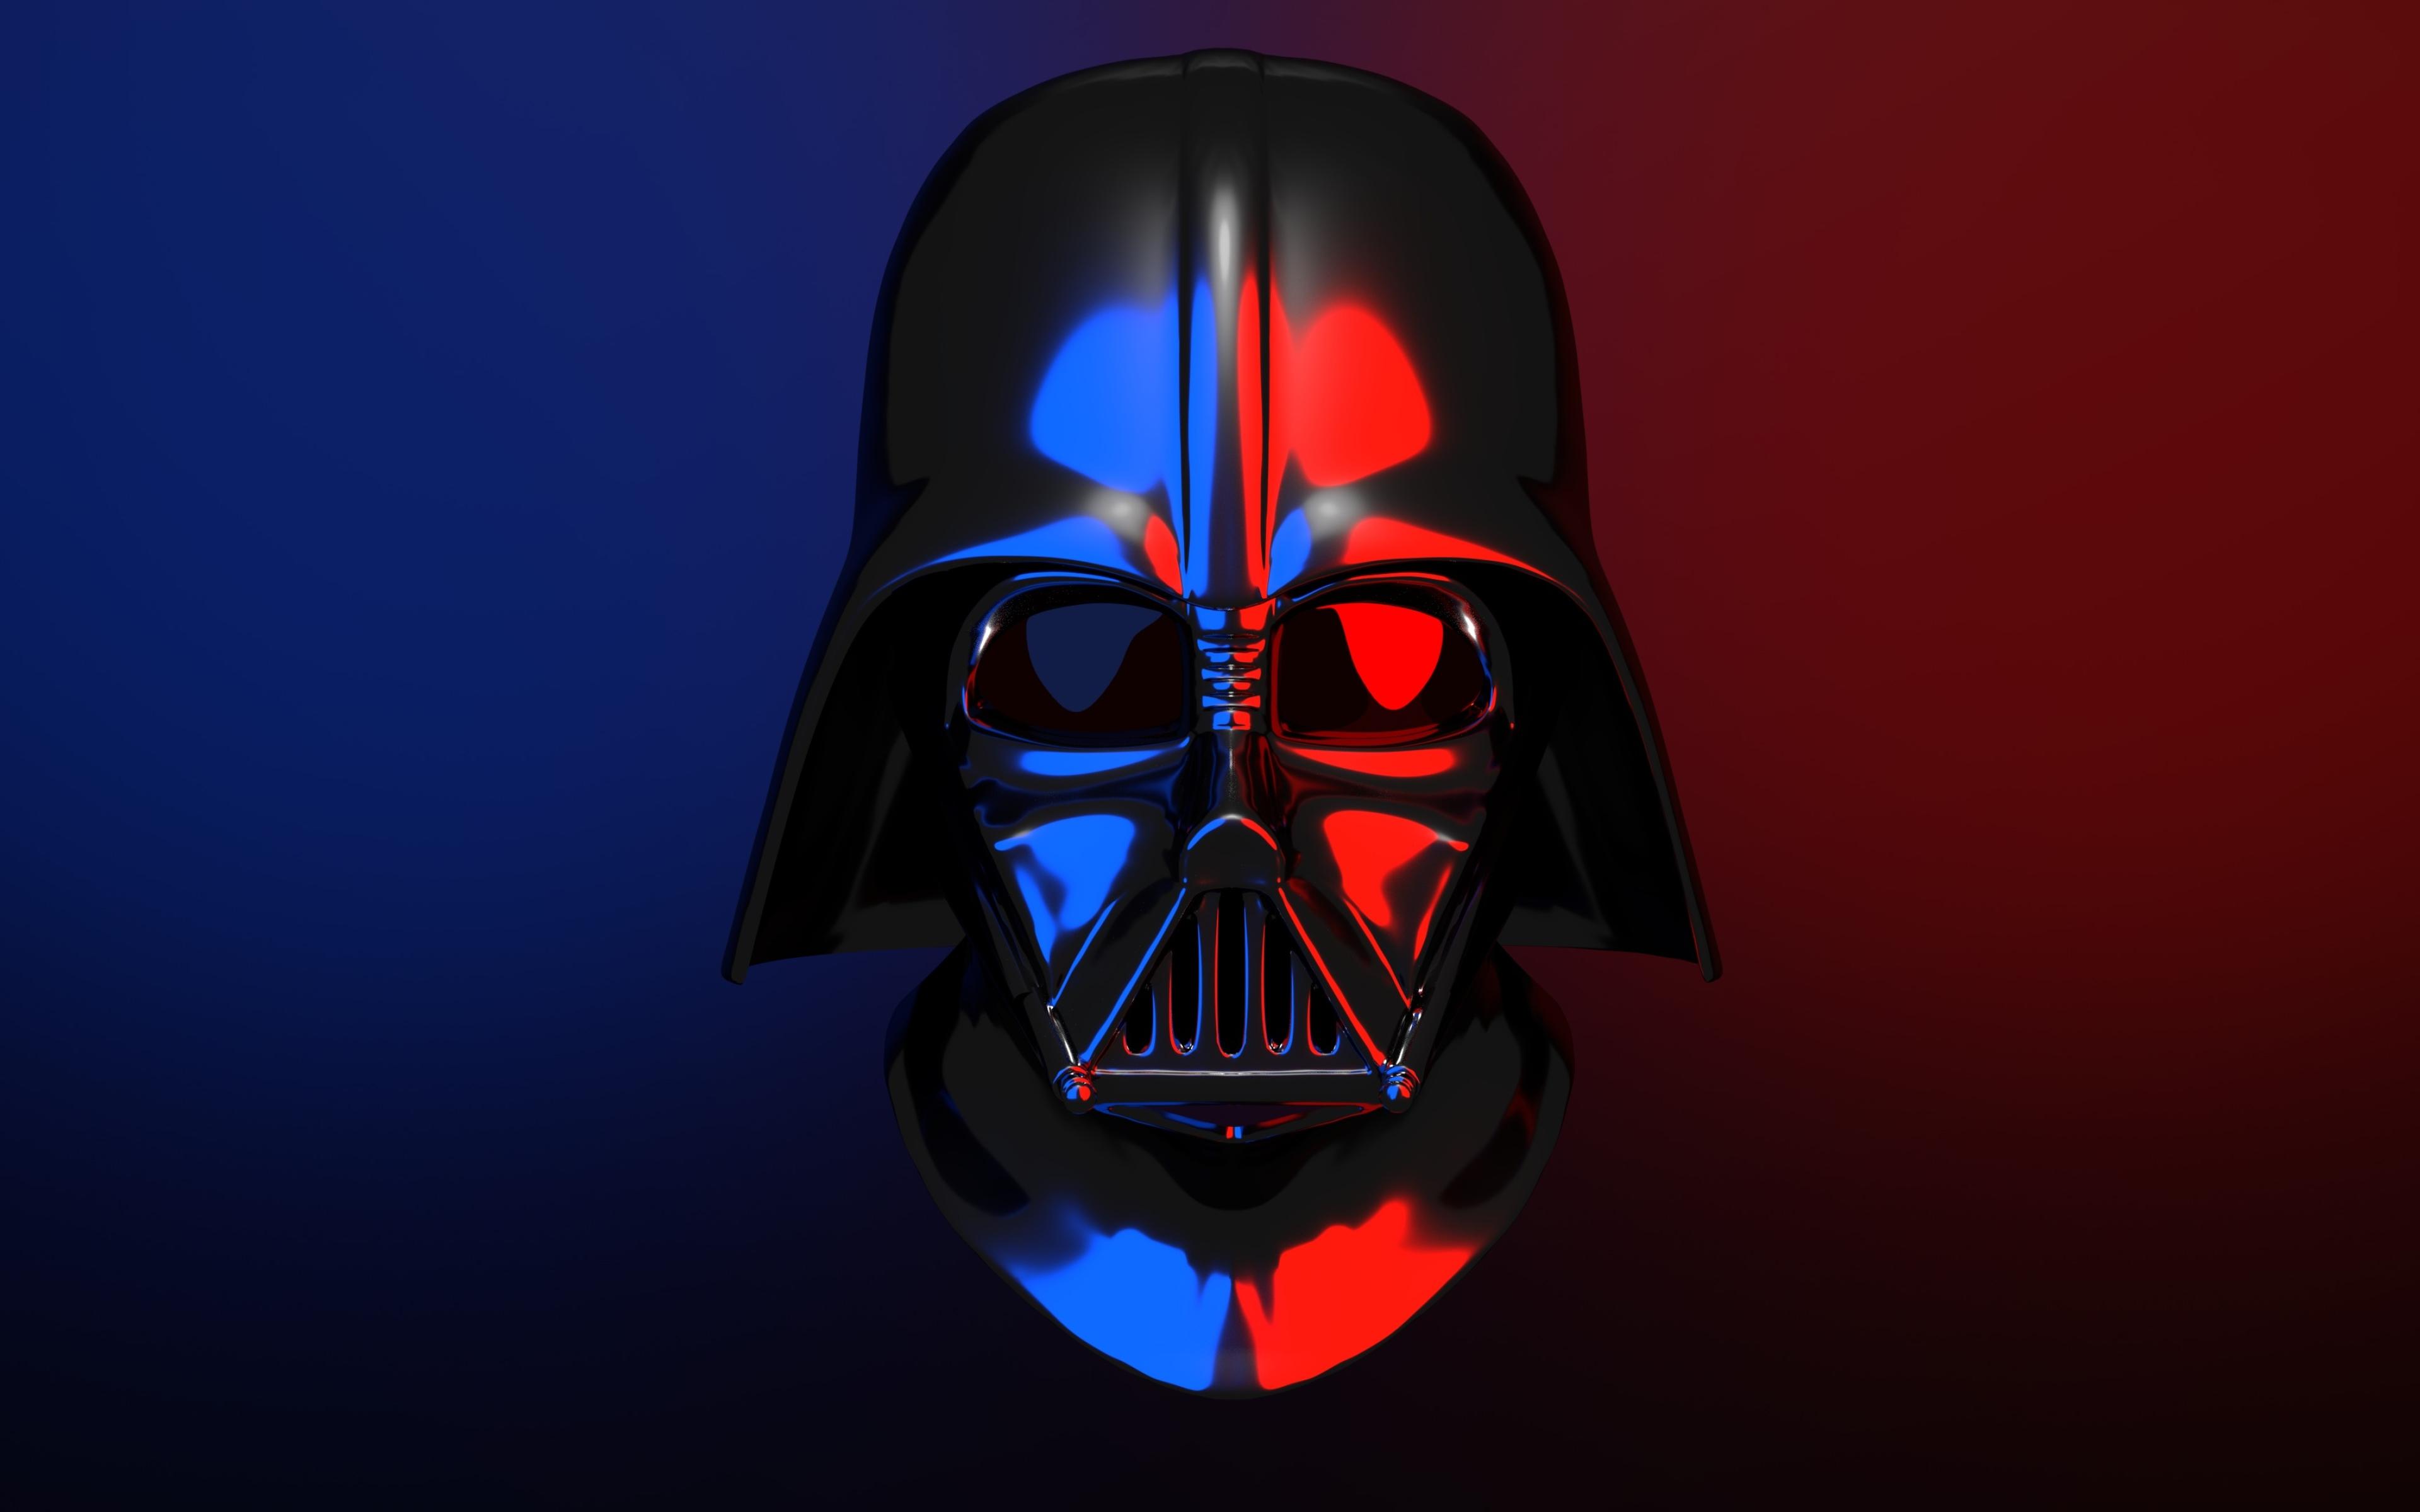 Download Darth Vader Star Wars Digital Artwork 950x1534